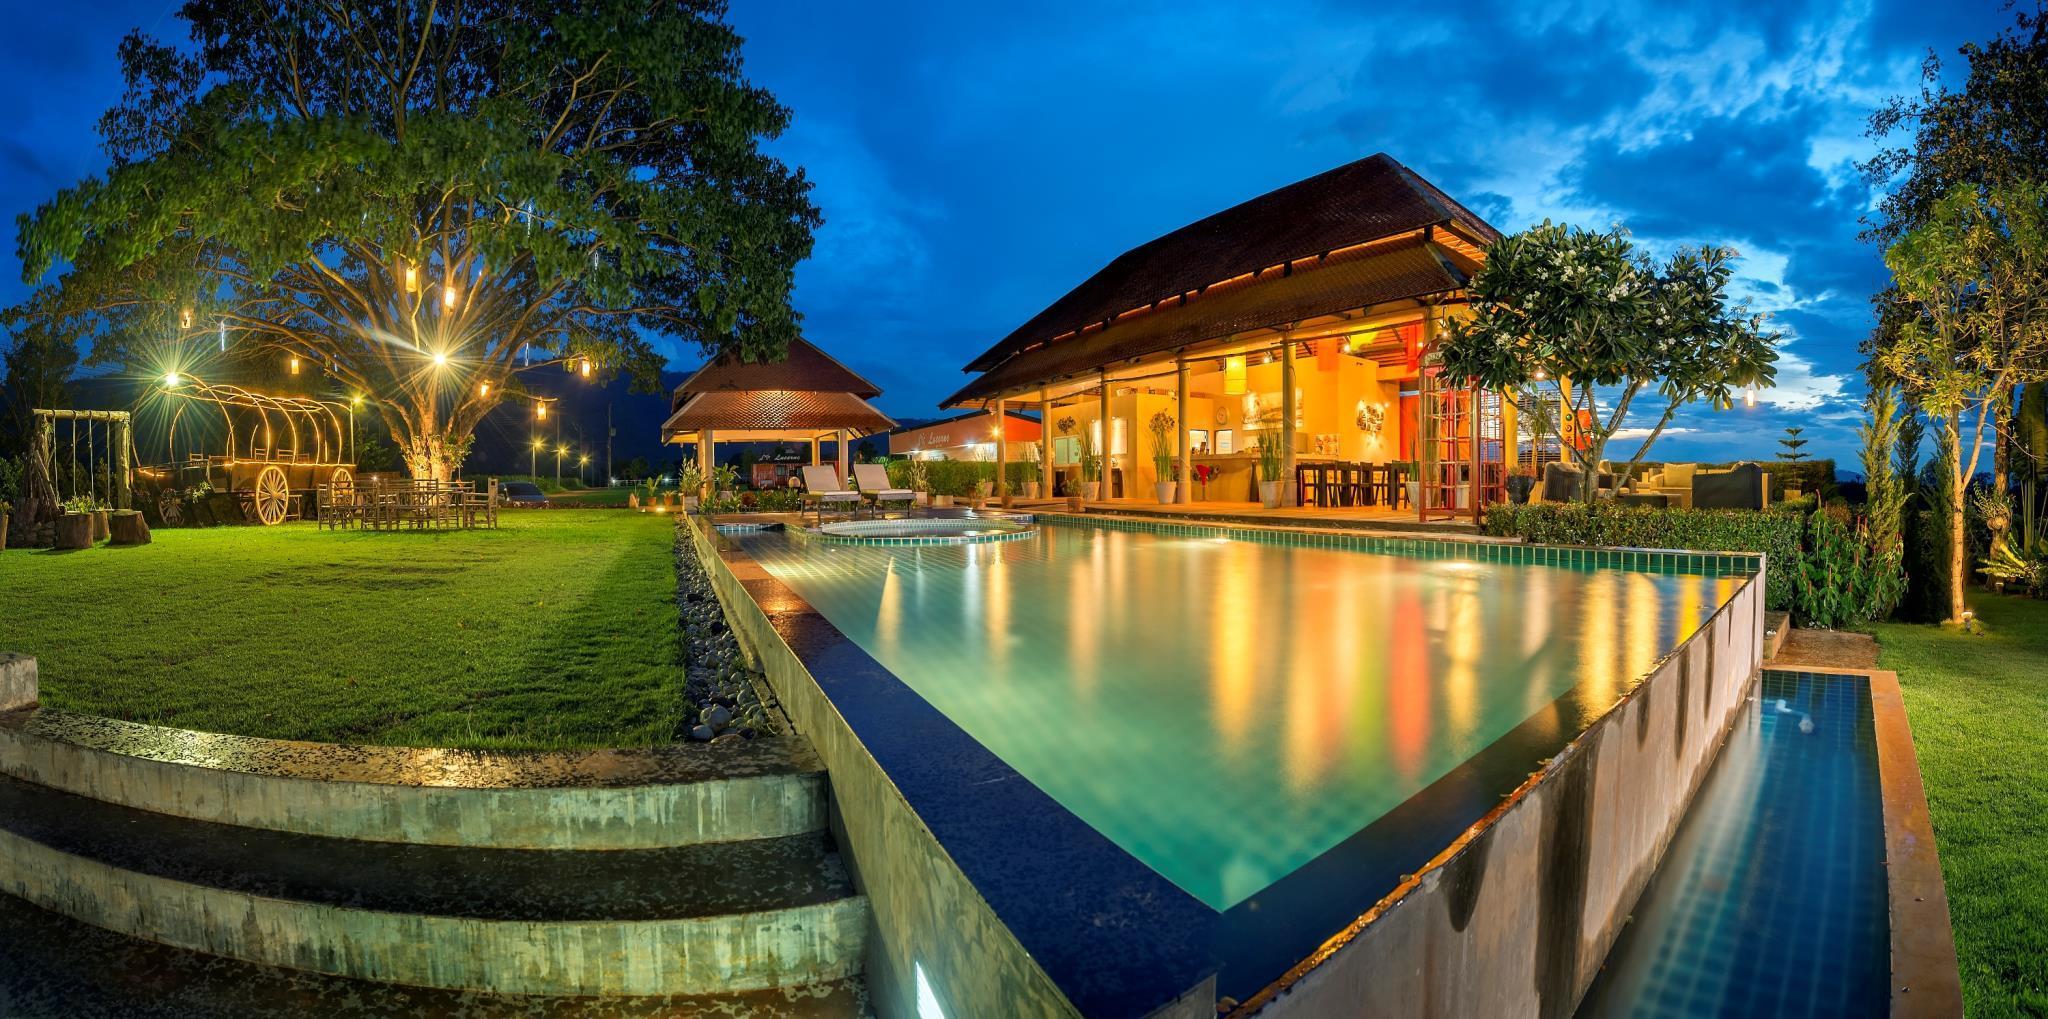 Lucerne Villa Resort by Qiu, Pak Chong